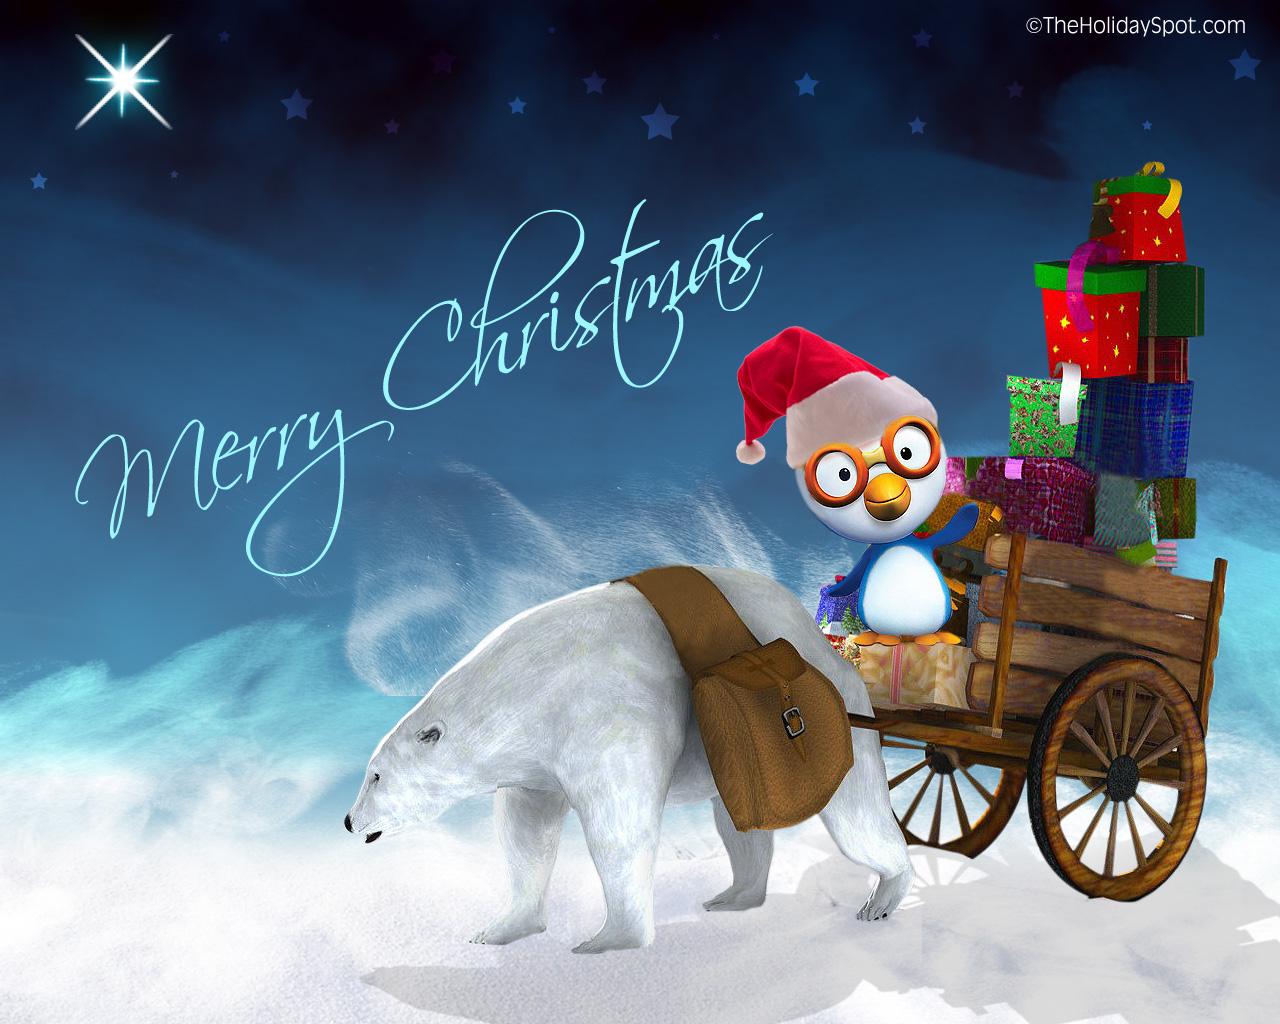 1280x1024 Christmas Wallpapers - 1280x1024 Merry Christmas wallpaper